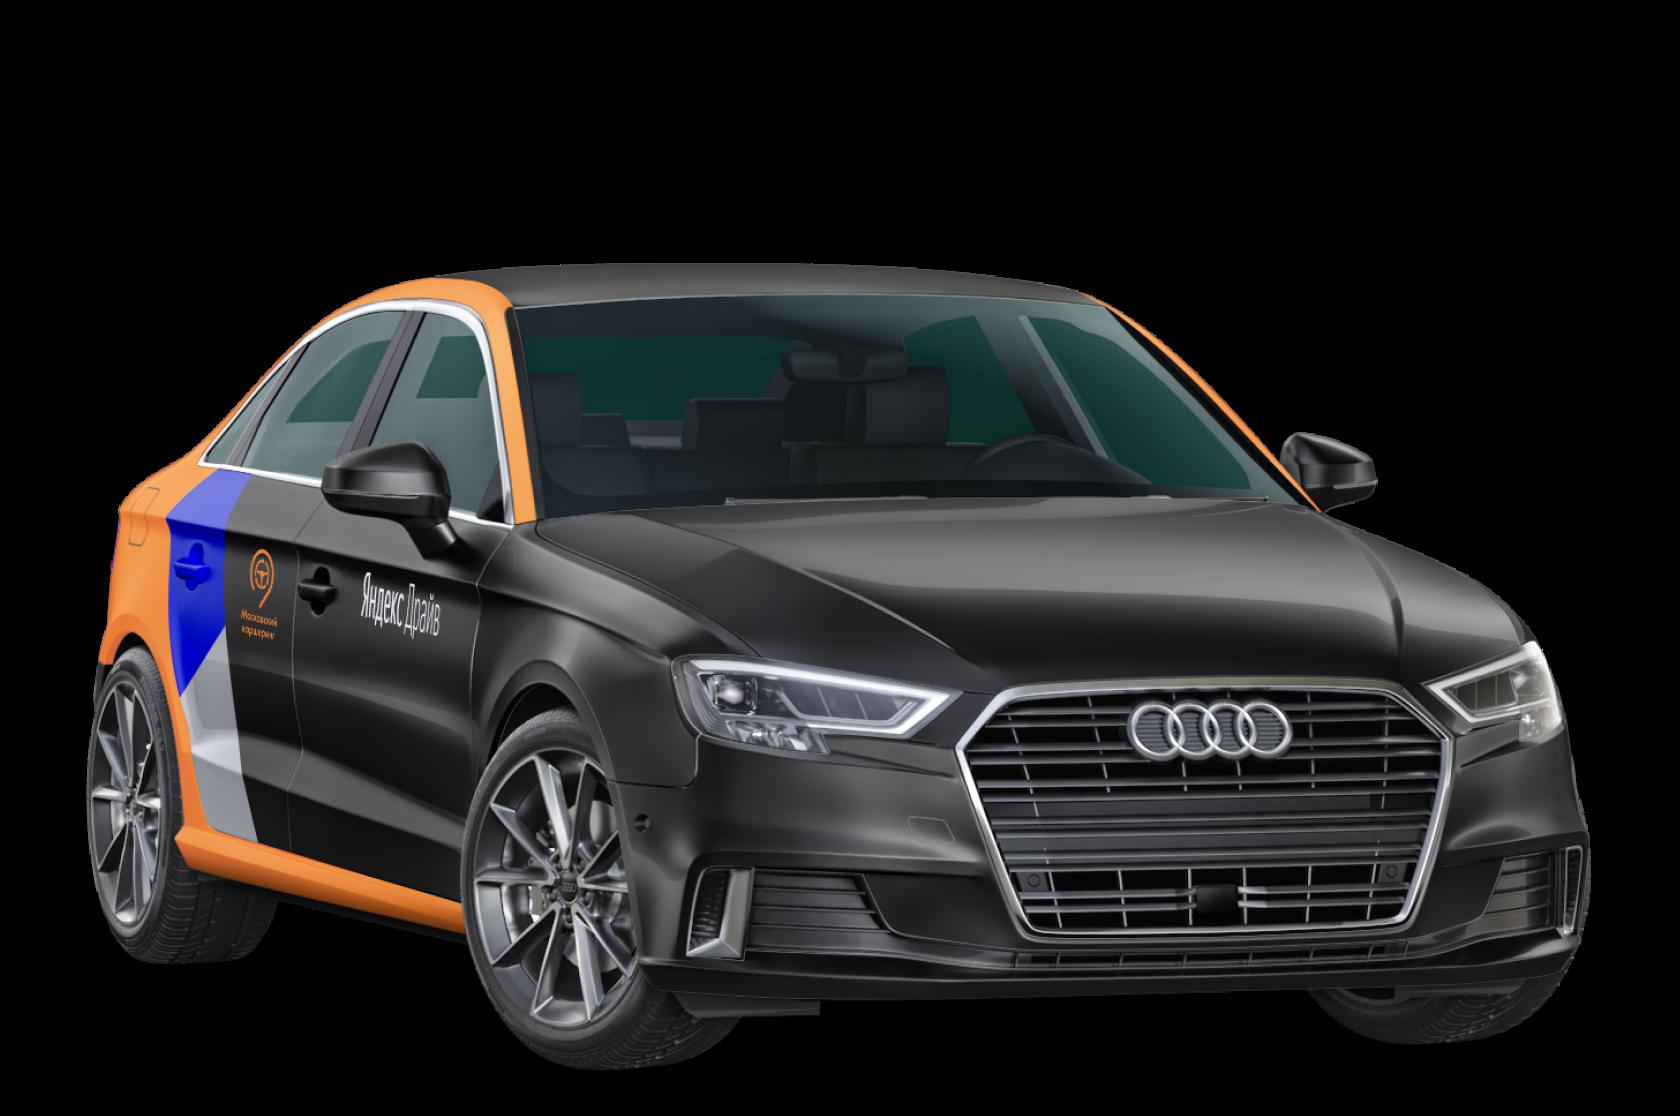 Audi<br>A3